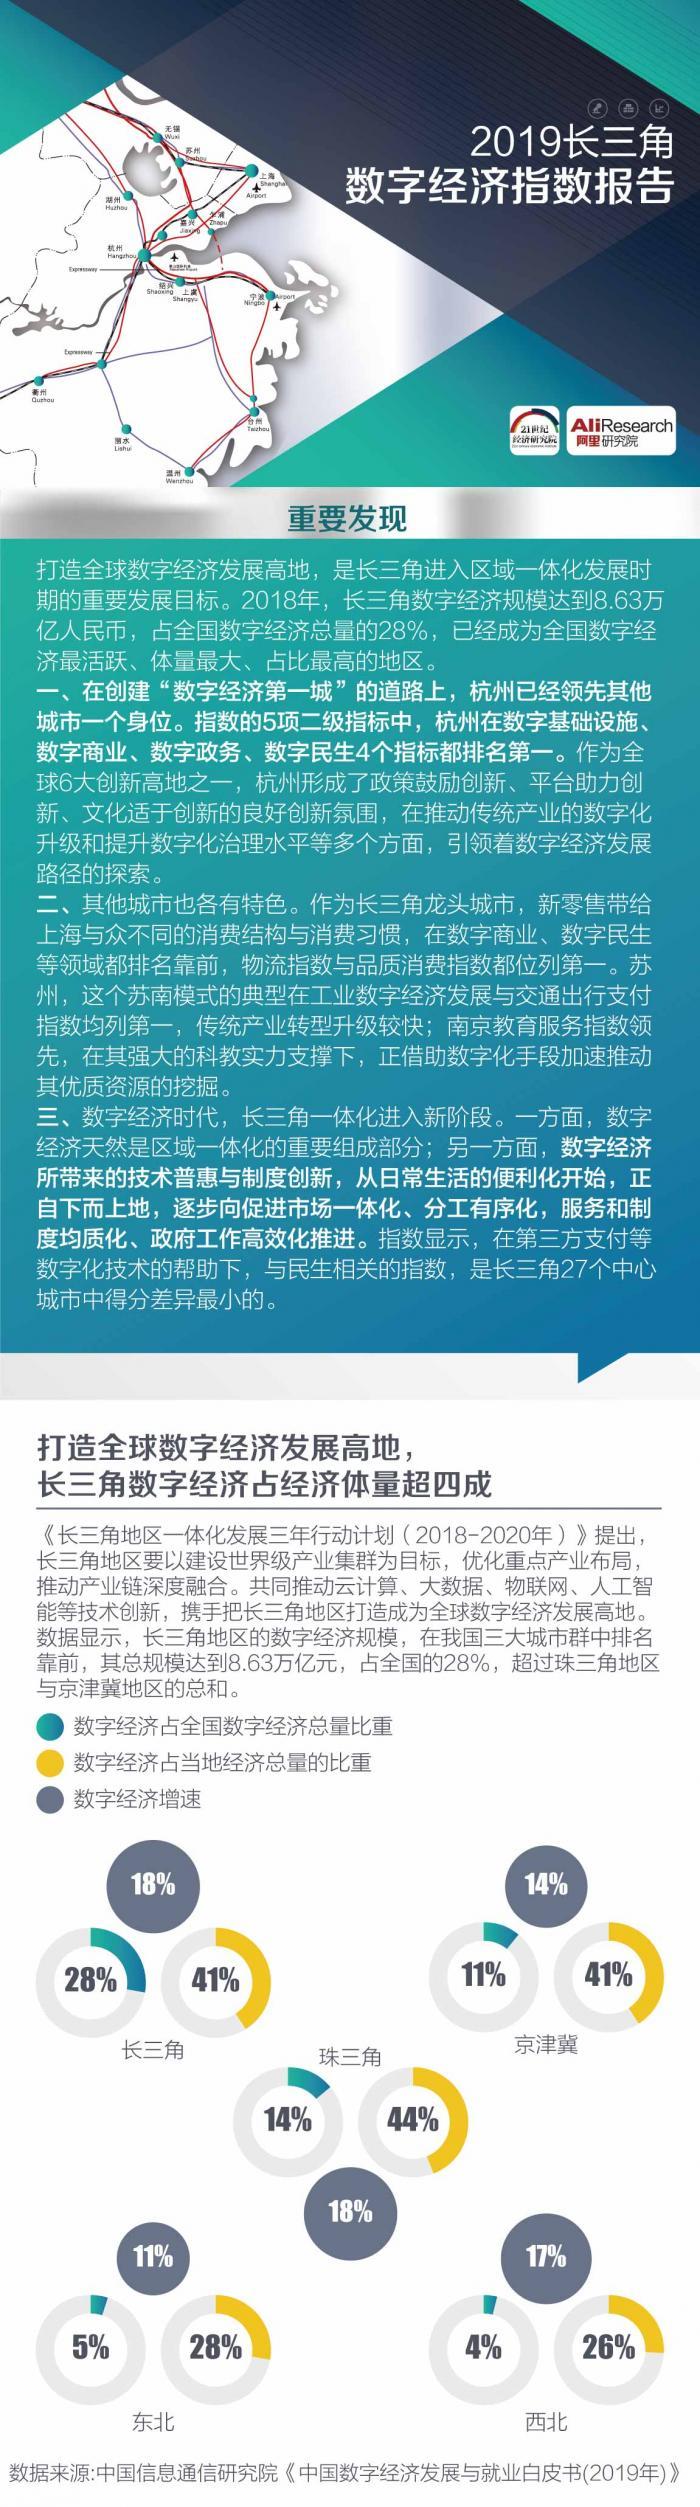 *ST刚泰:控股股东持有的3.65亿股被法院裁定划转抵债